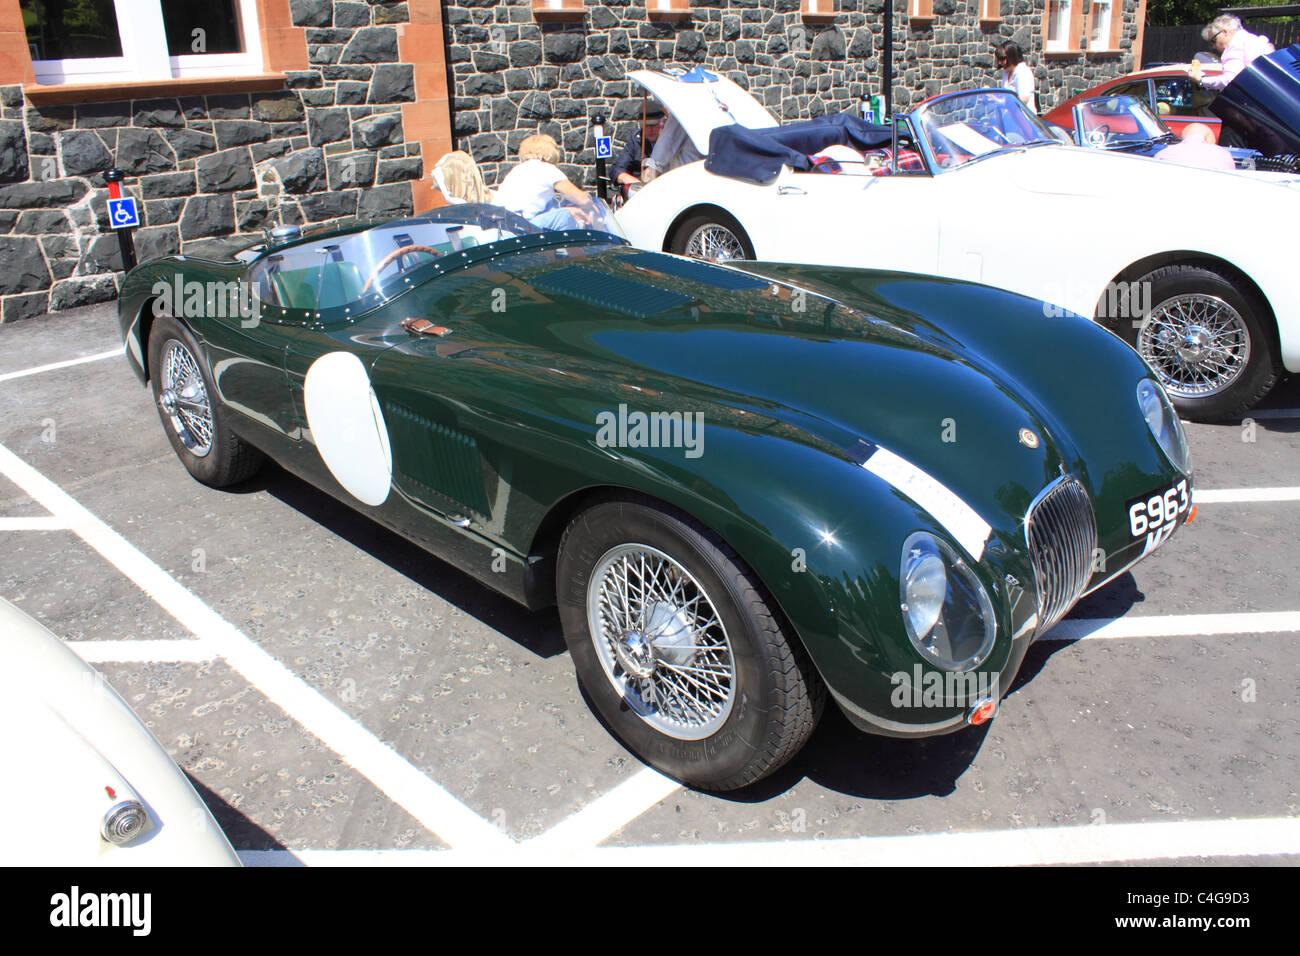 Jaguar C-type replica at the 2011 Cultra Hillclimb Event